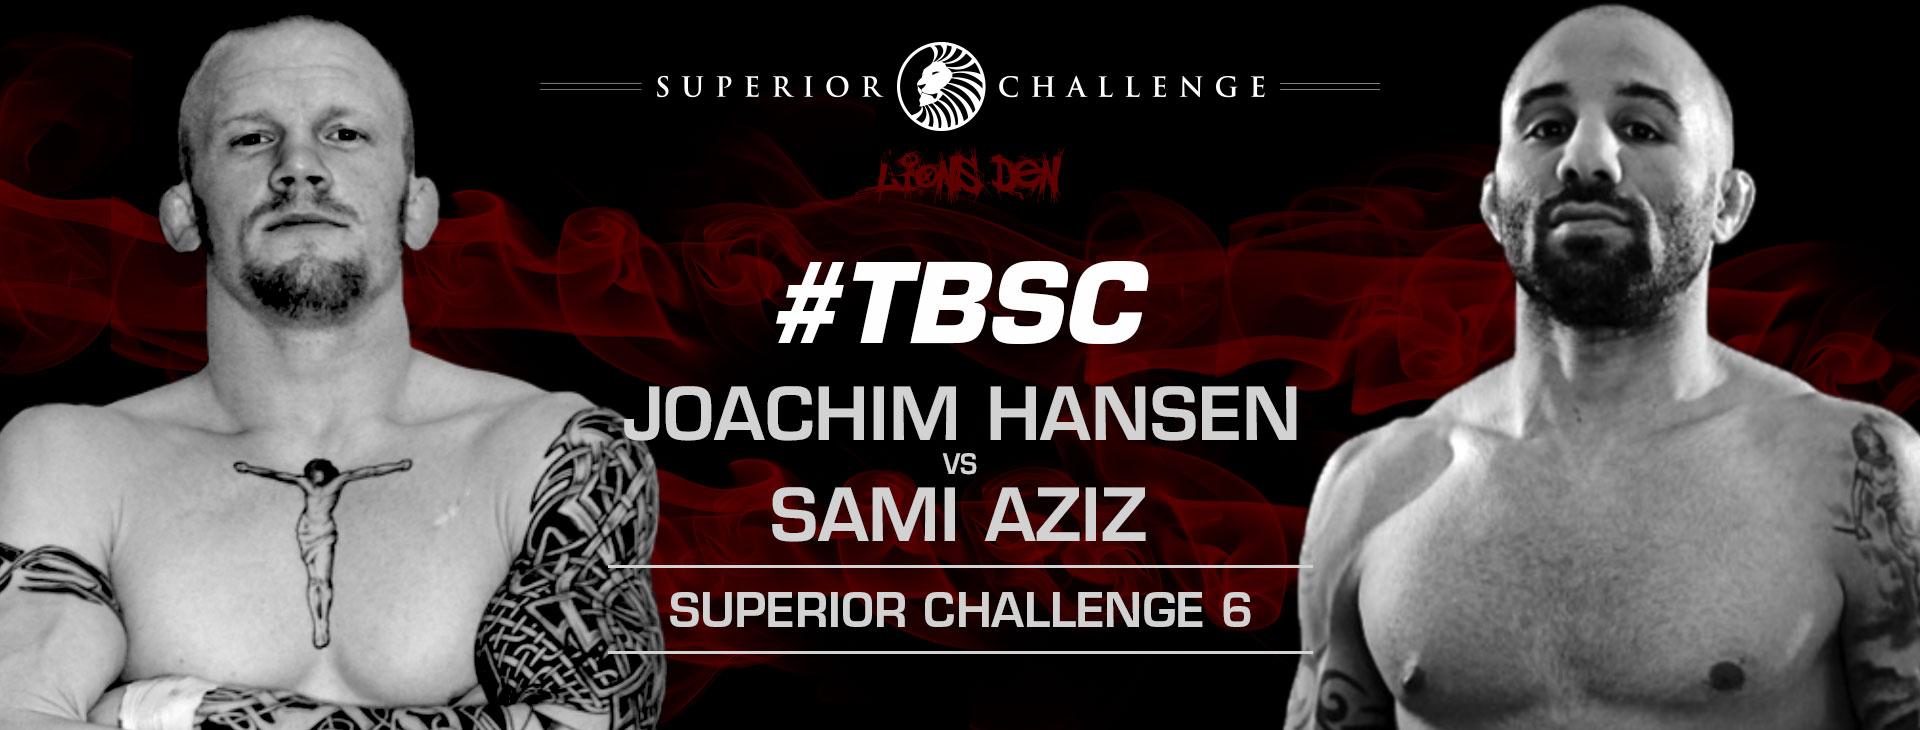 "Joachim ""Hellboy"" Hansen vs Sami ""Uzi"" Aziz Superior Challenge 6"